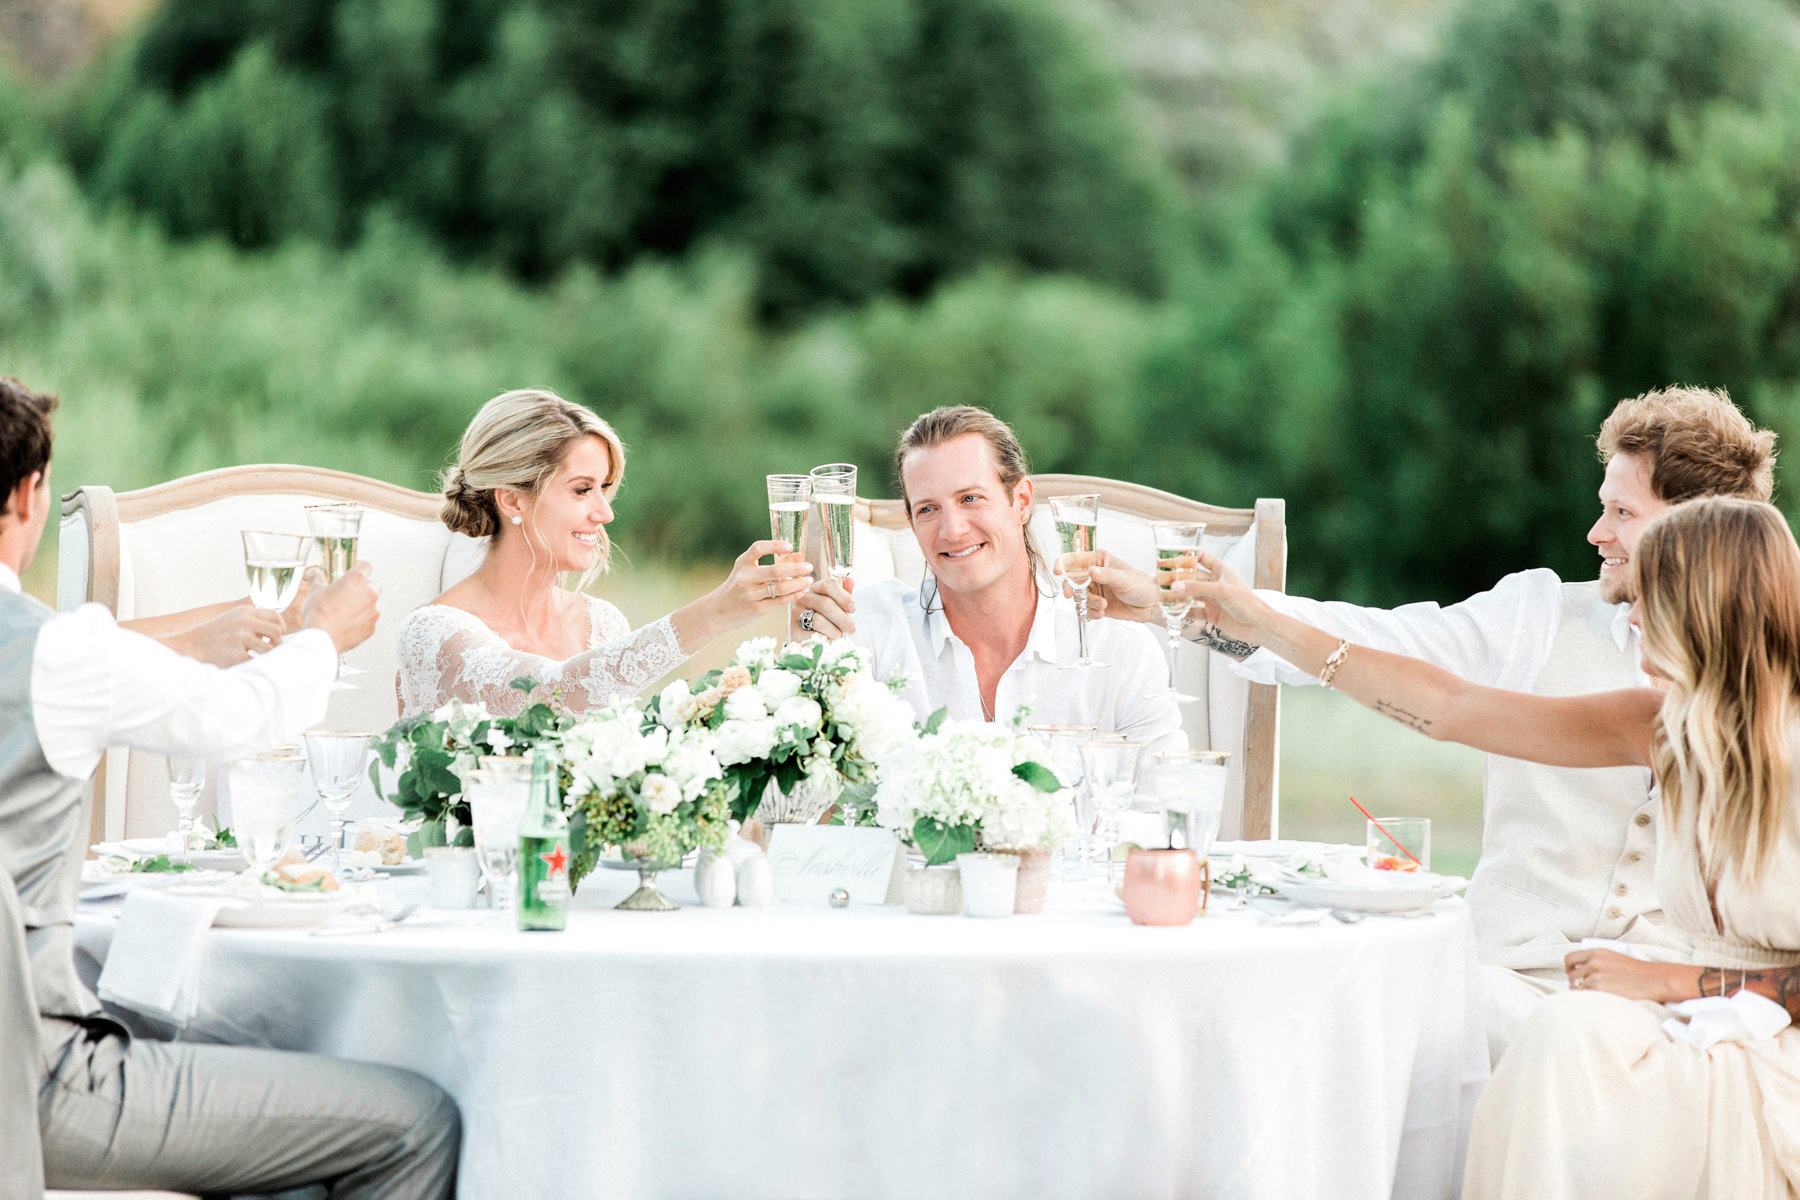 tyler-hubbard-wedding-15.jpg